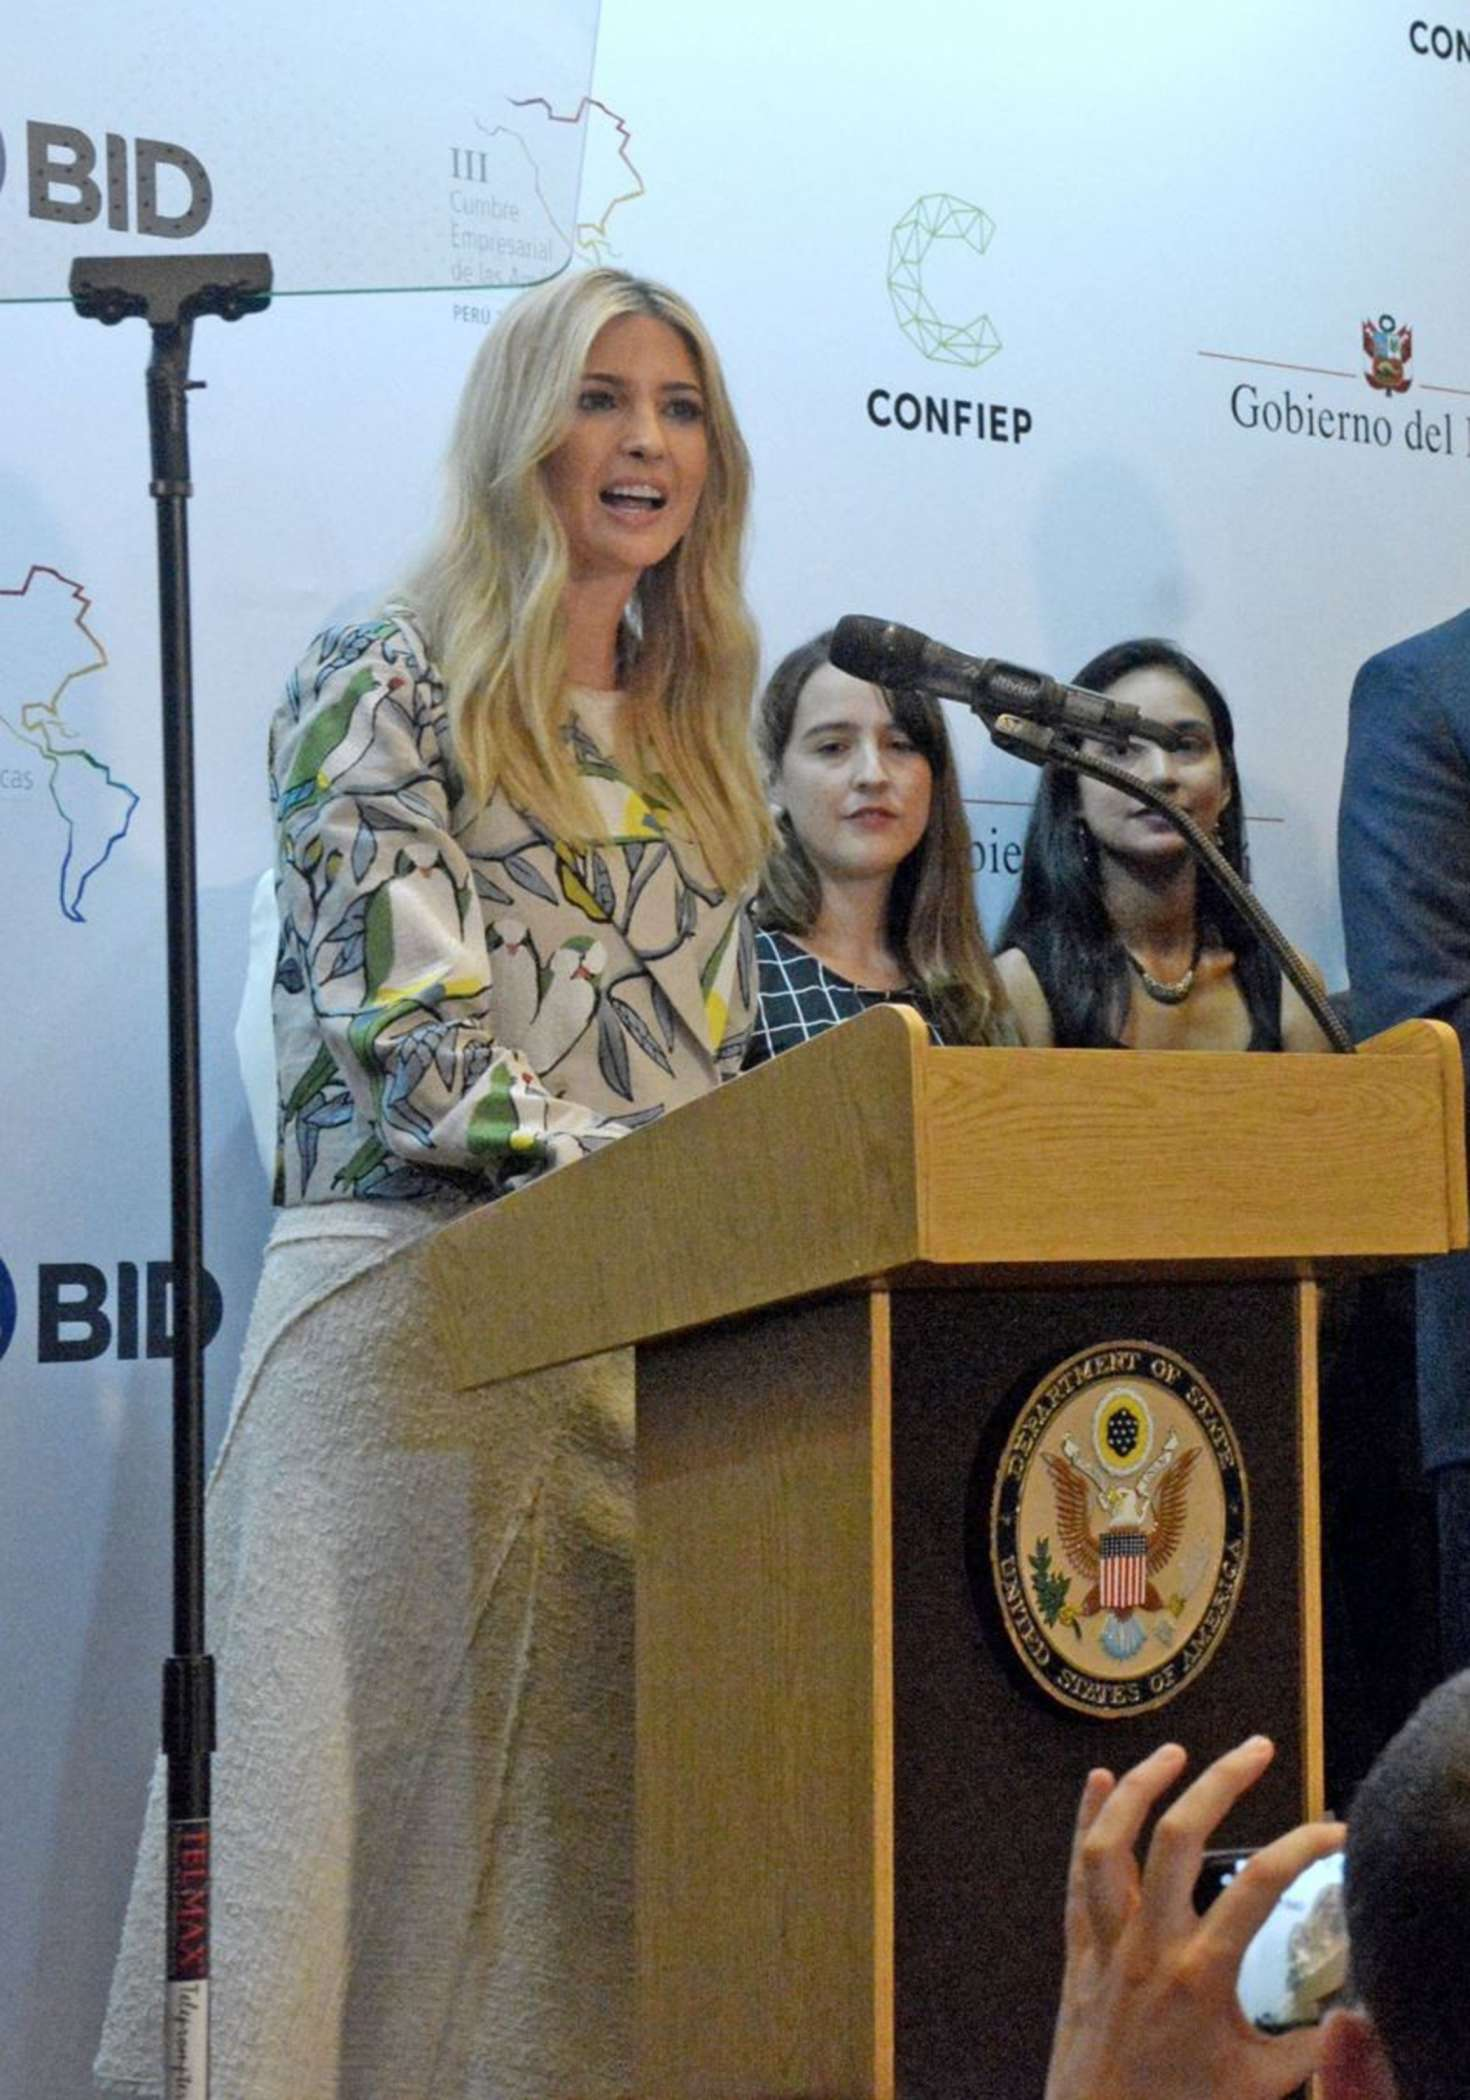 Ivanka Trump 2018 : Ivanka Trump: III Summit of the Americas CEO in Lima -12